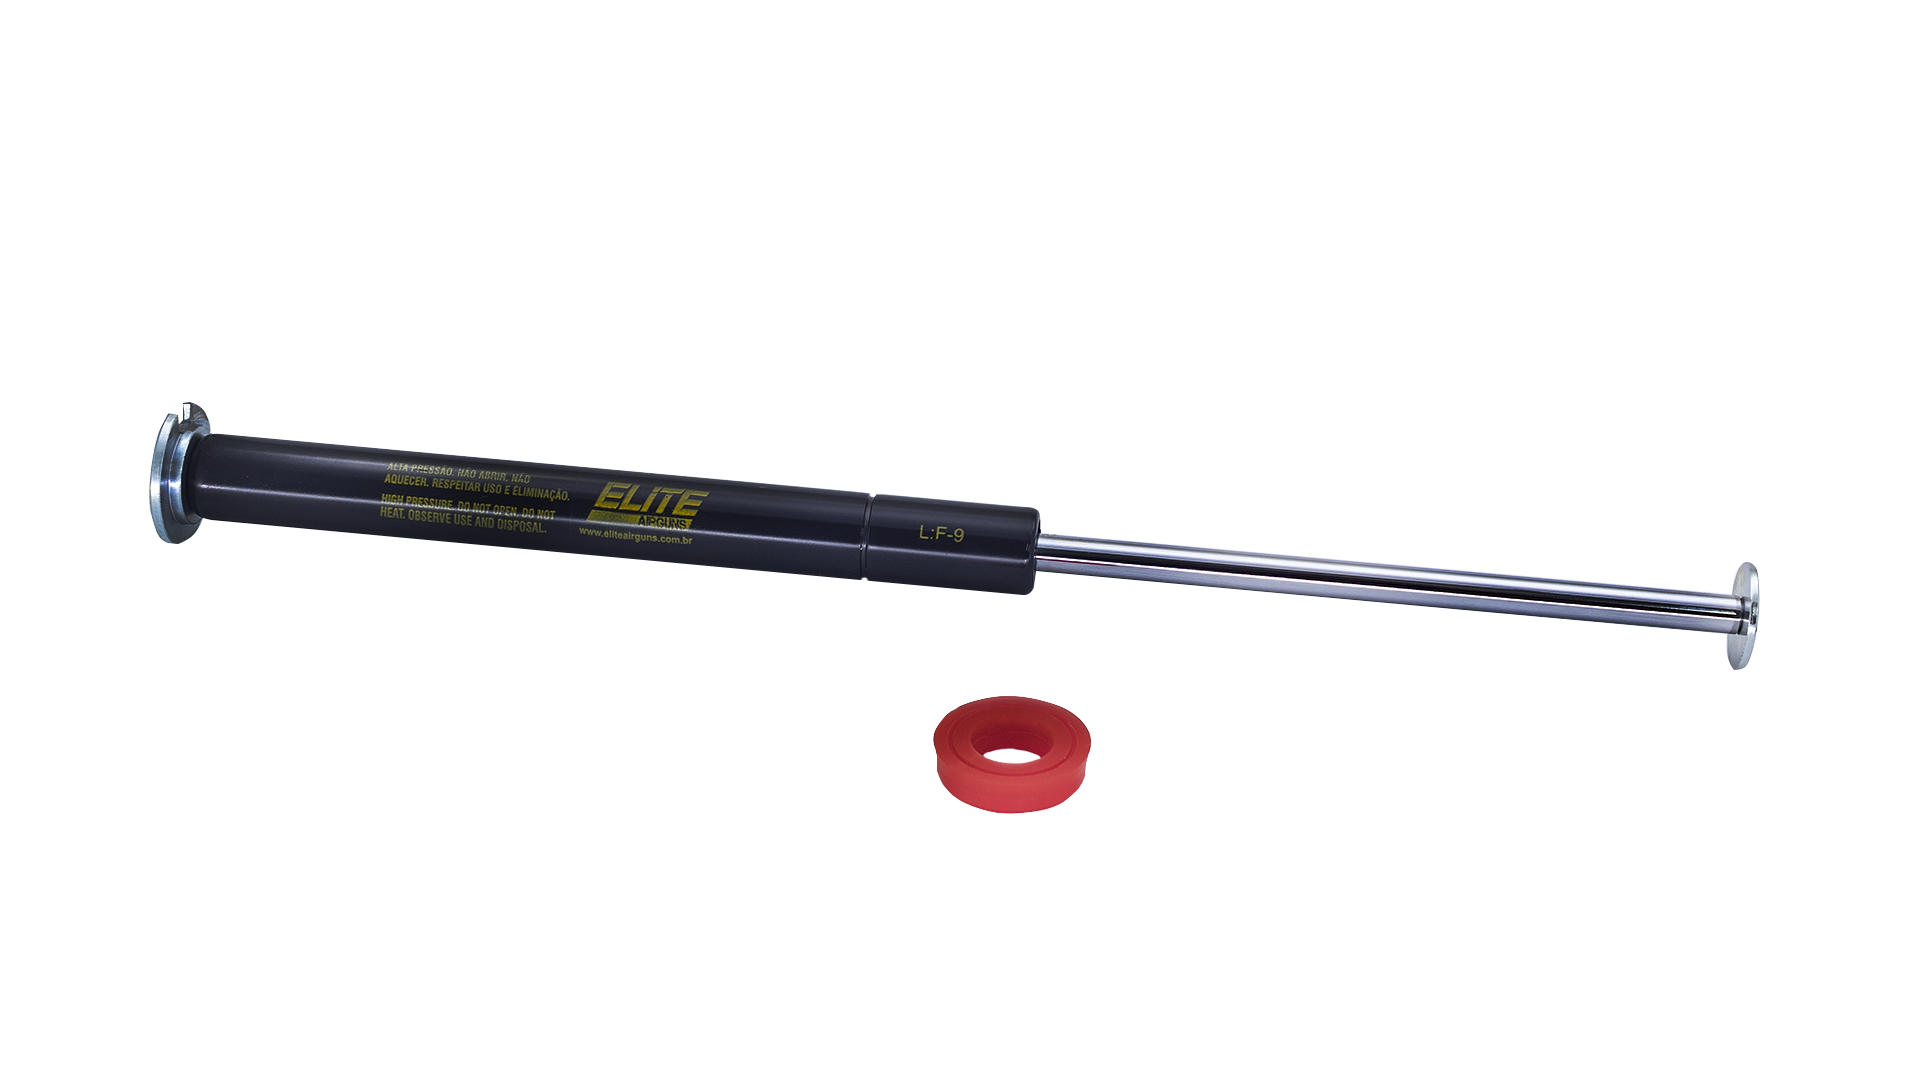 Kit Standard Hatsan 125- Modo de Uso